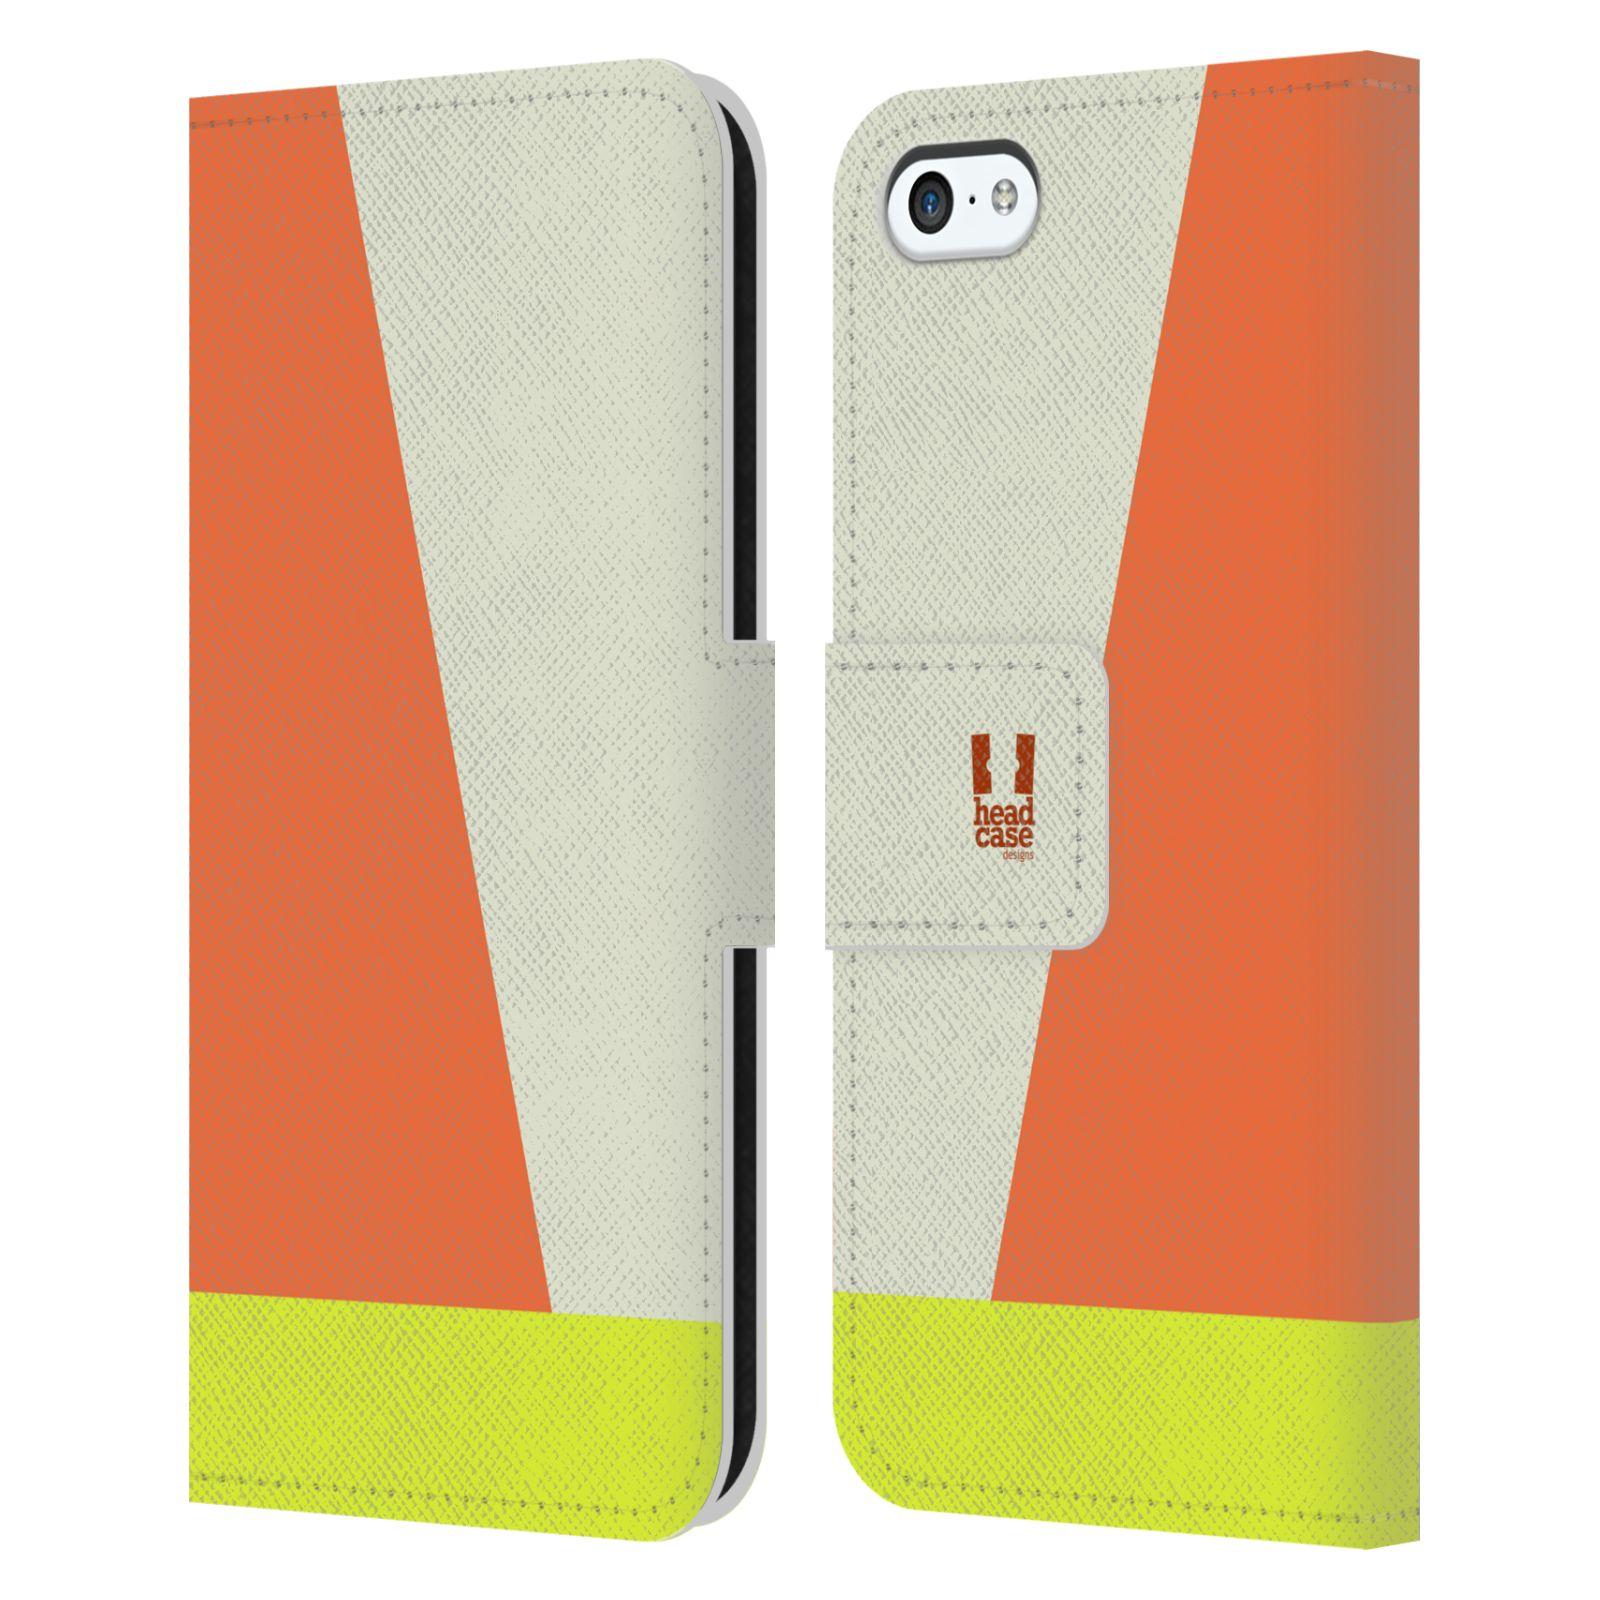 HEAD CASE Flipové pouzdro pro mobil Apple Iphone 5C barevné tvary slonová kost